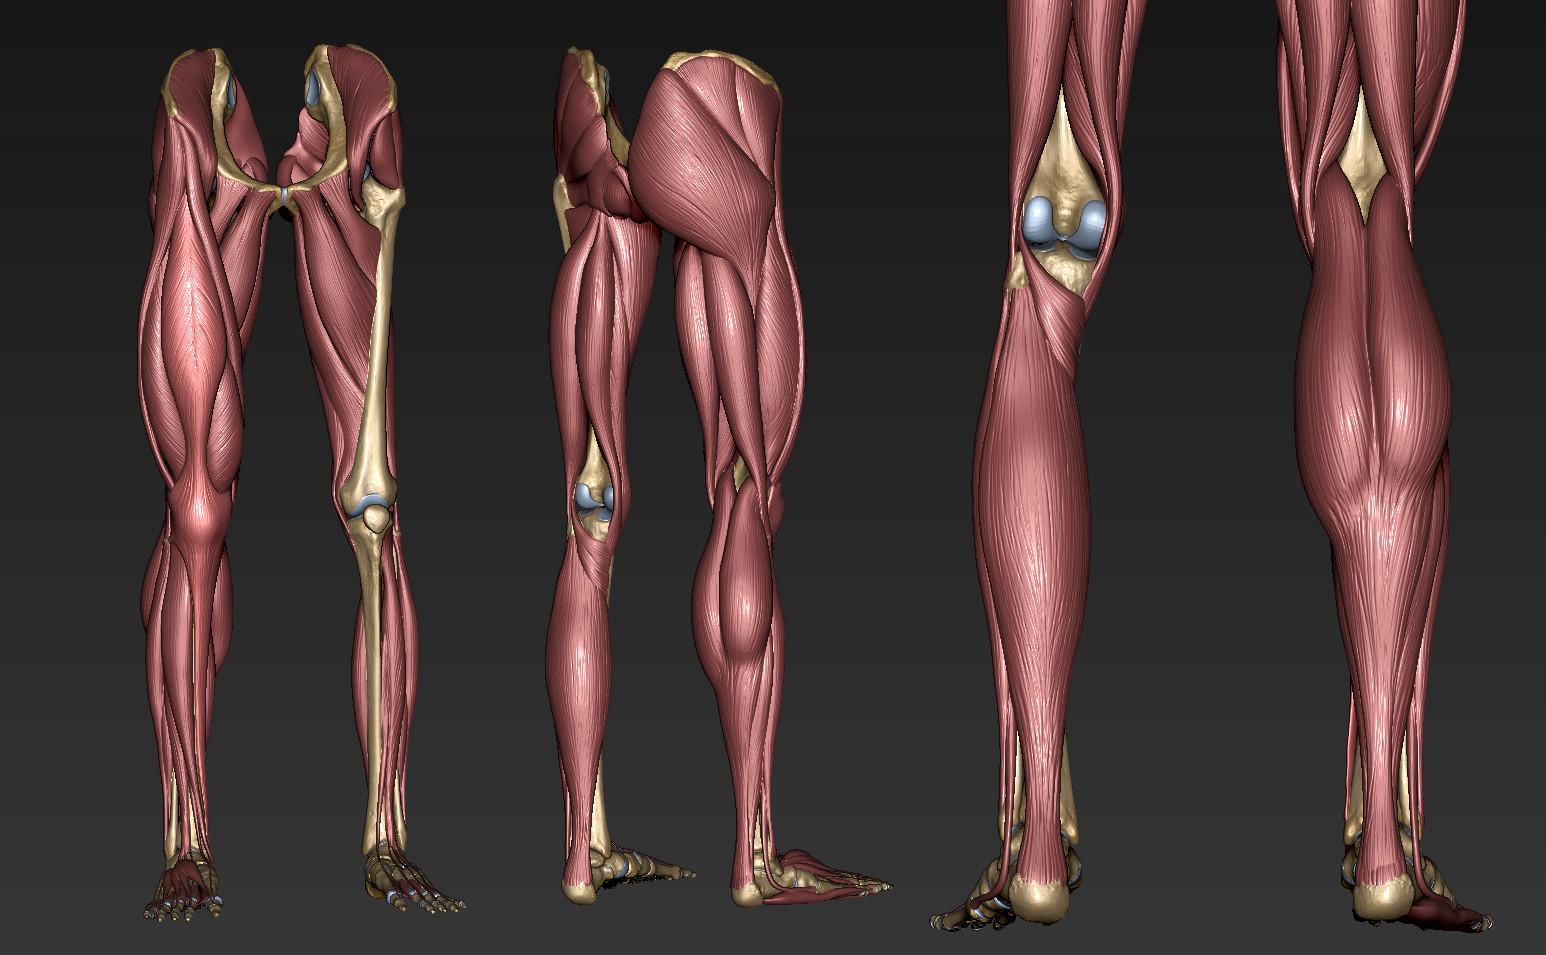 Andrey gritsuk leg muscles 2